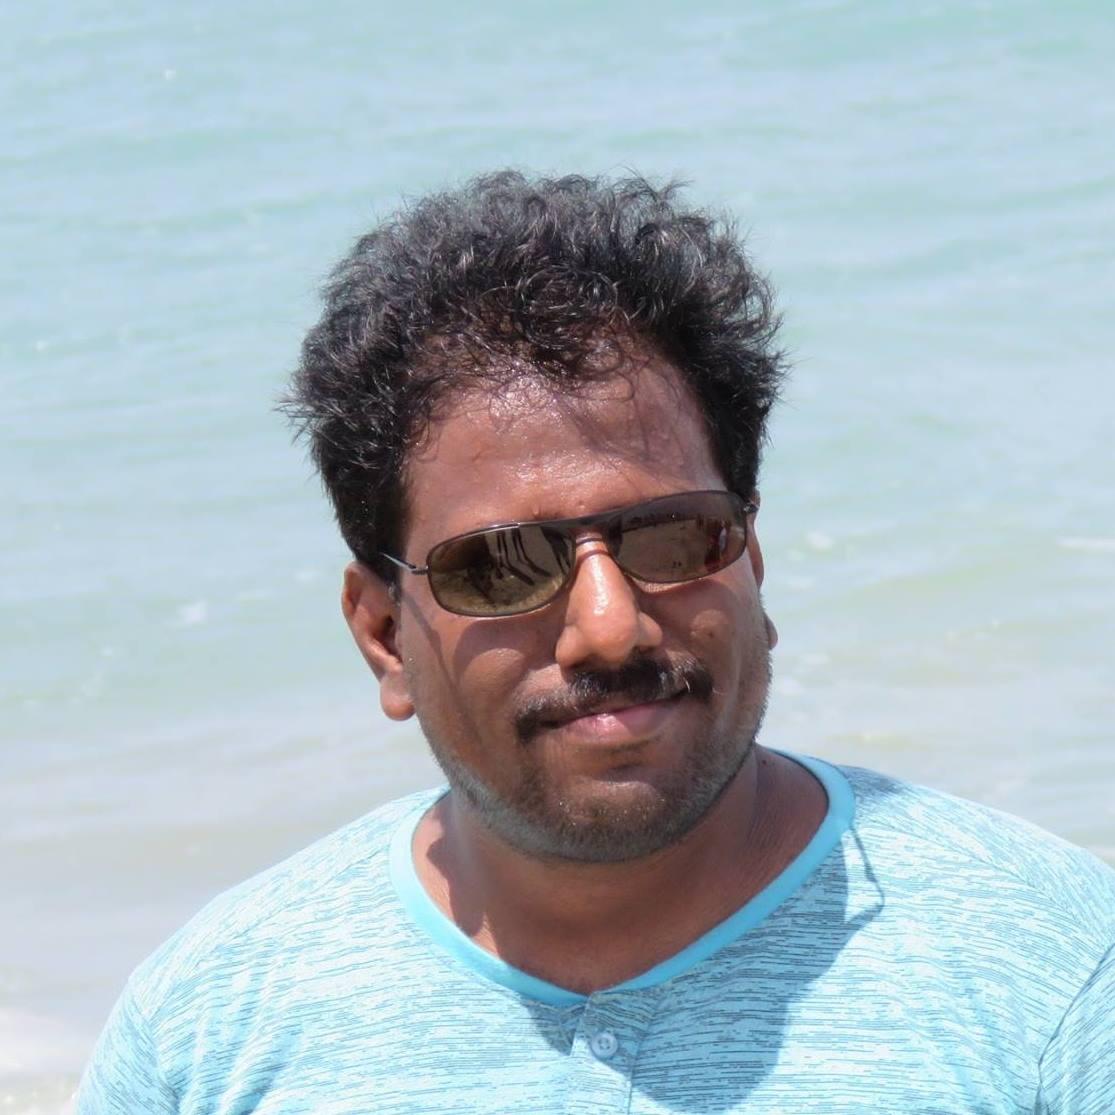 Scala code to access documents in AWS S3 bucket - Sakthi Priyan H